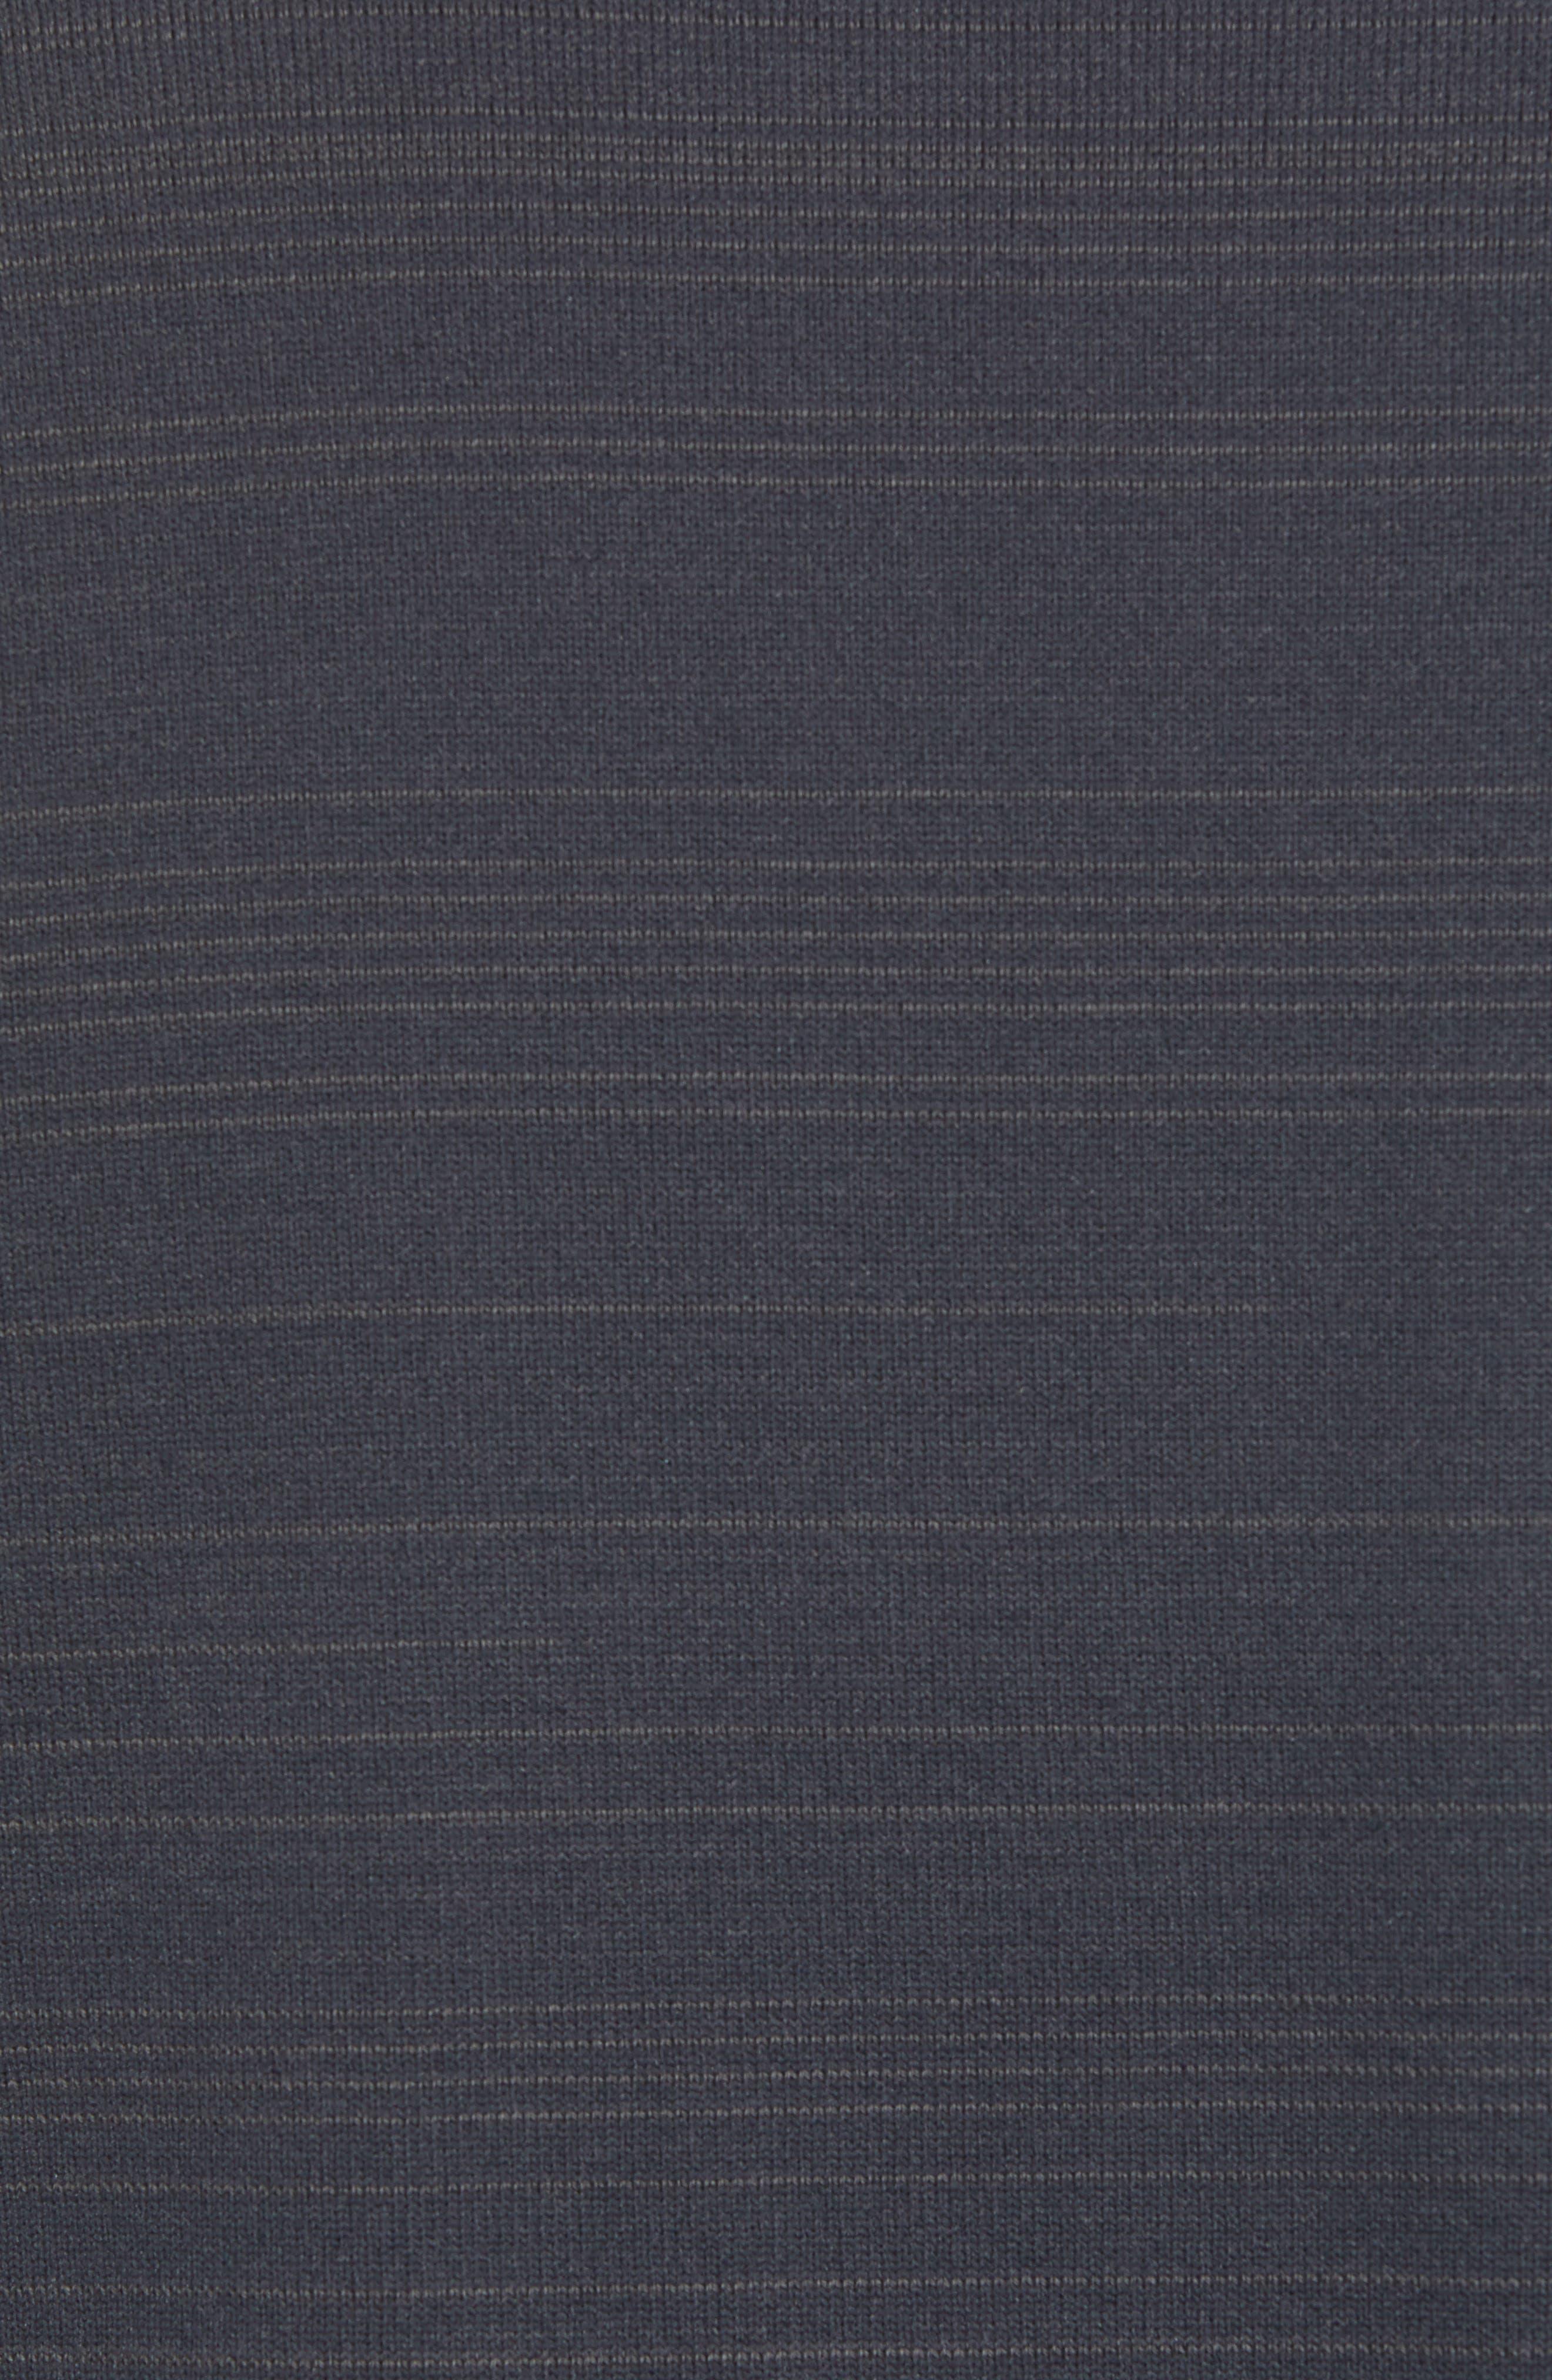 CUTTER & BUCK,                             Impact V-Neck Sweater,                             Alternate thumbnail 5, color,                             010